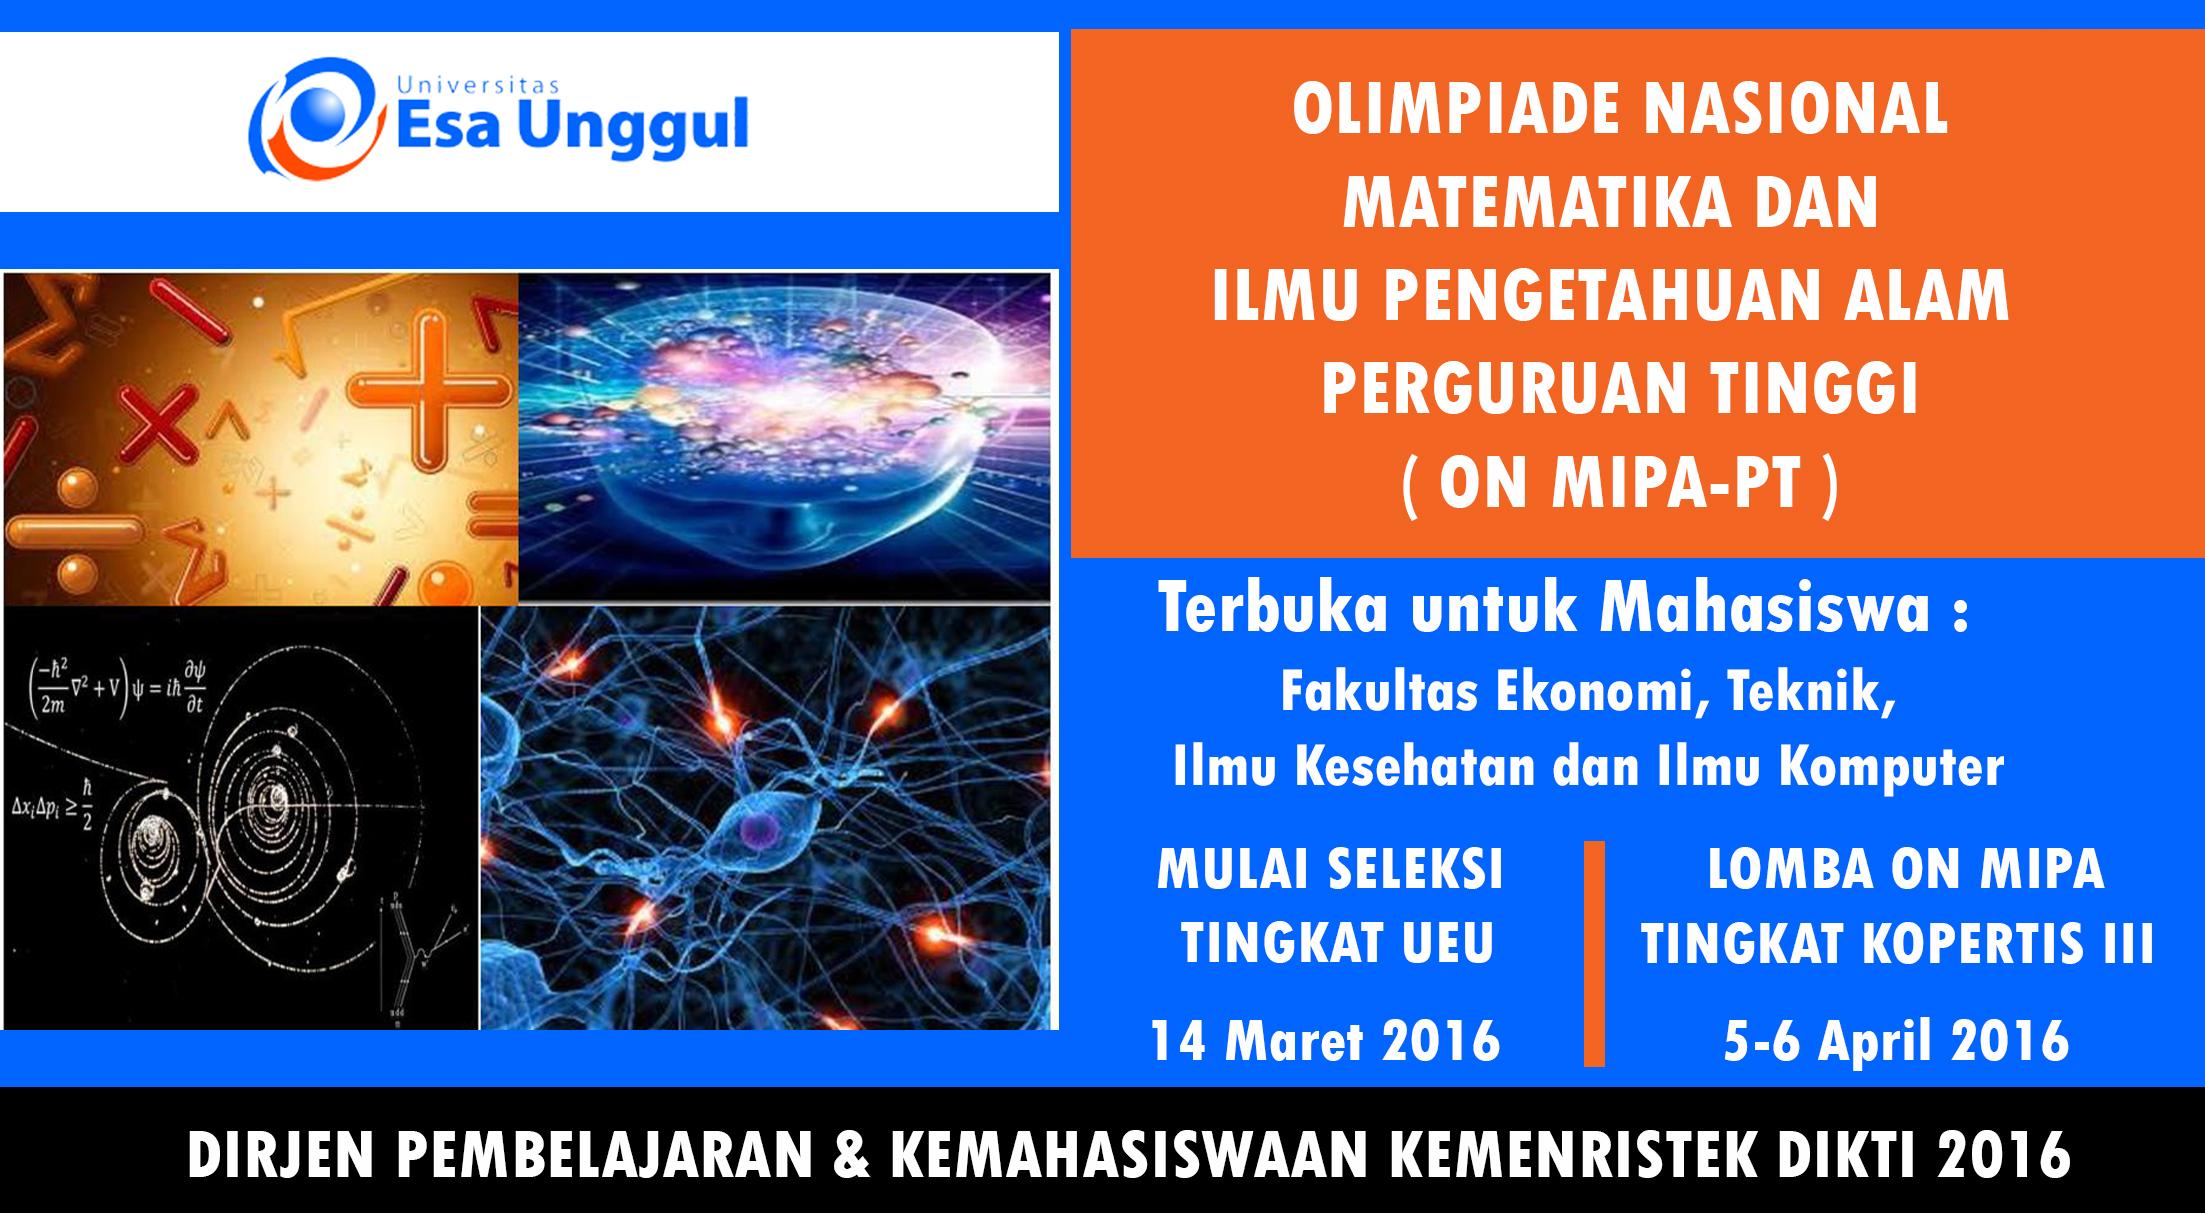 Lomba Olimpiade Nasional Matematika dan Ilmu Pengetahuan Alam Perguruan Tinggi 2016